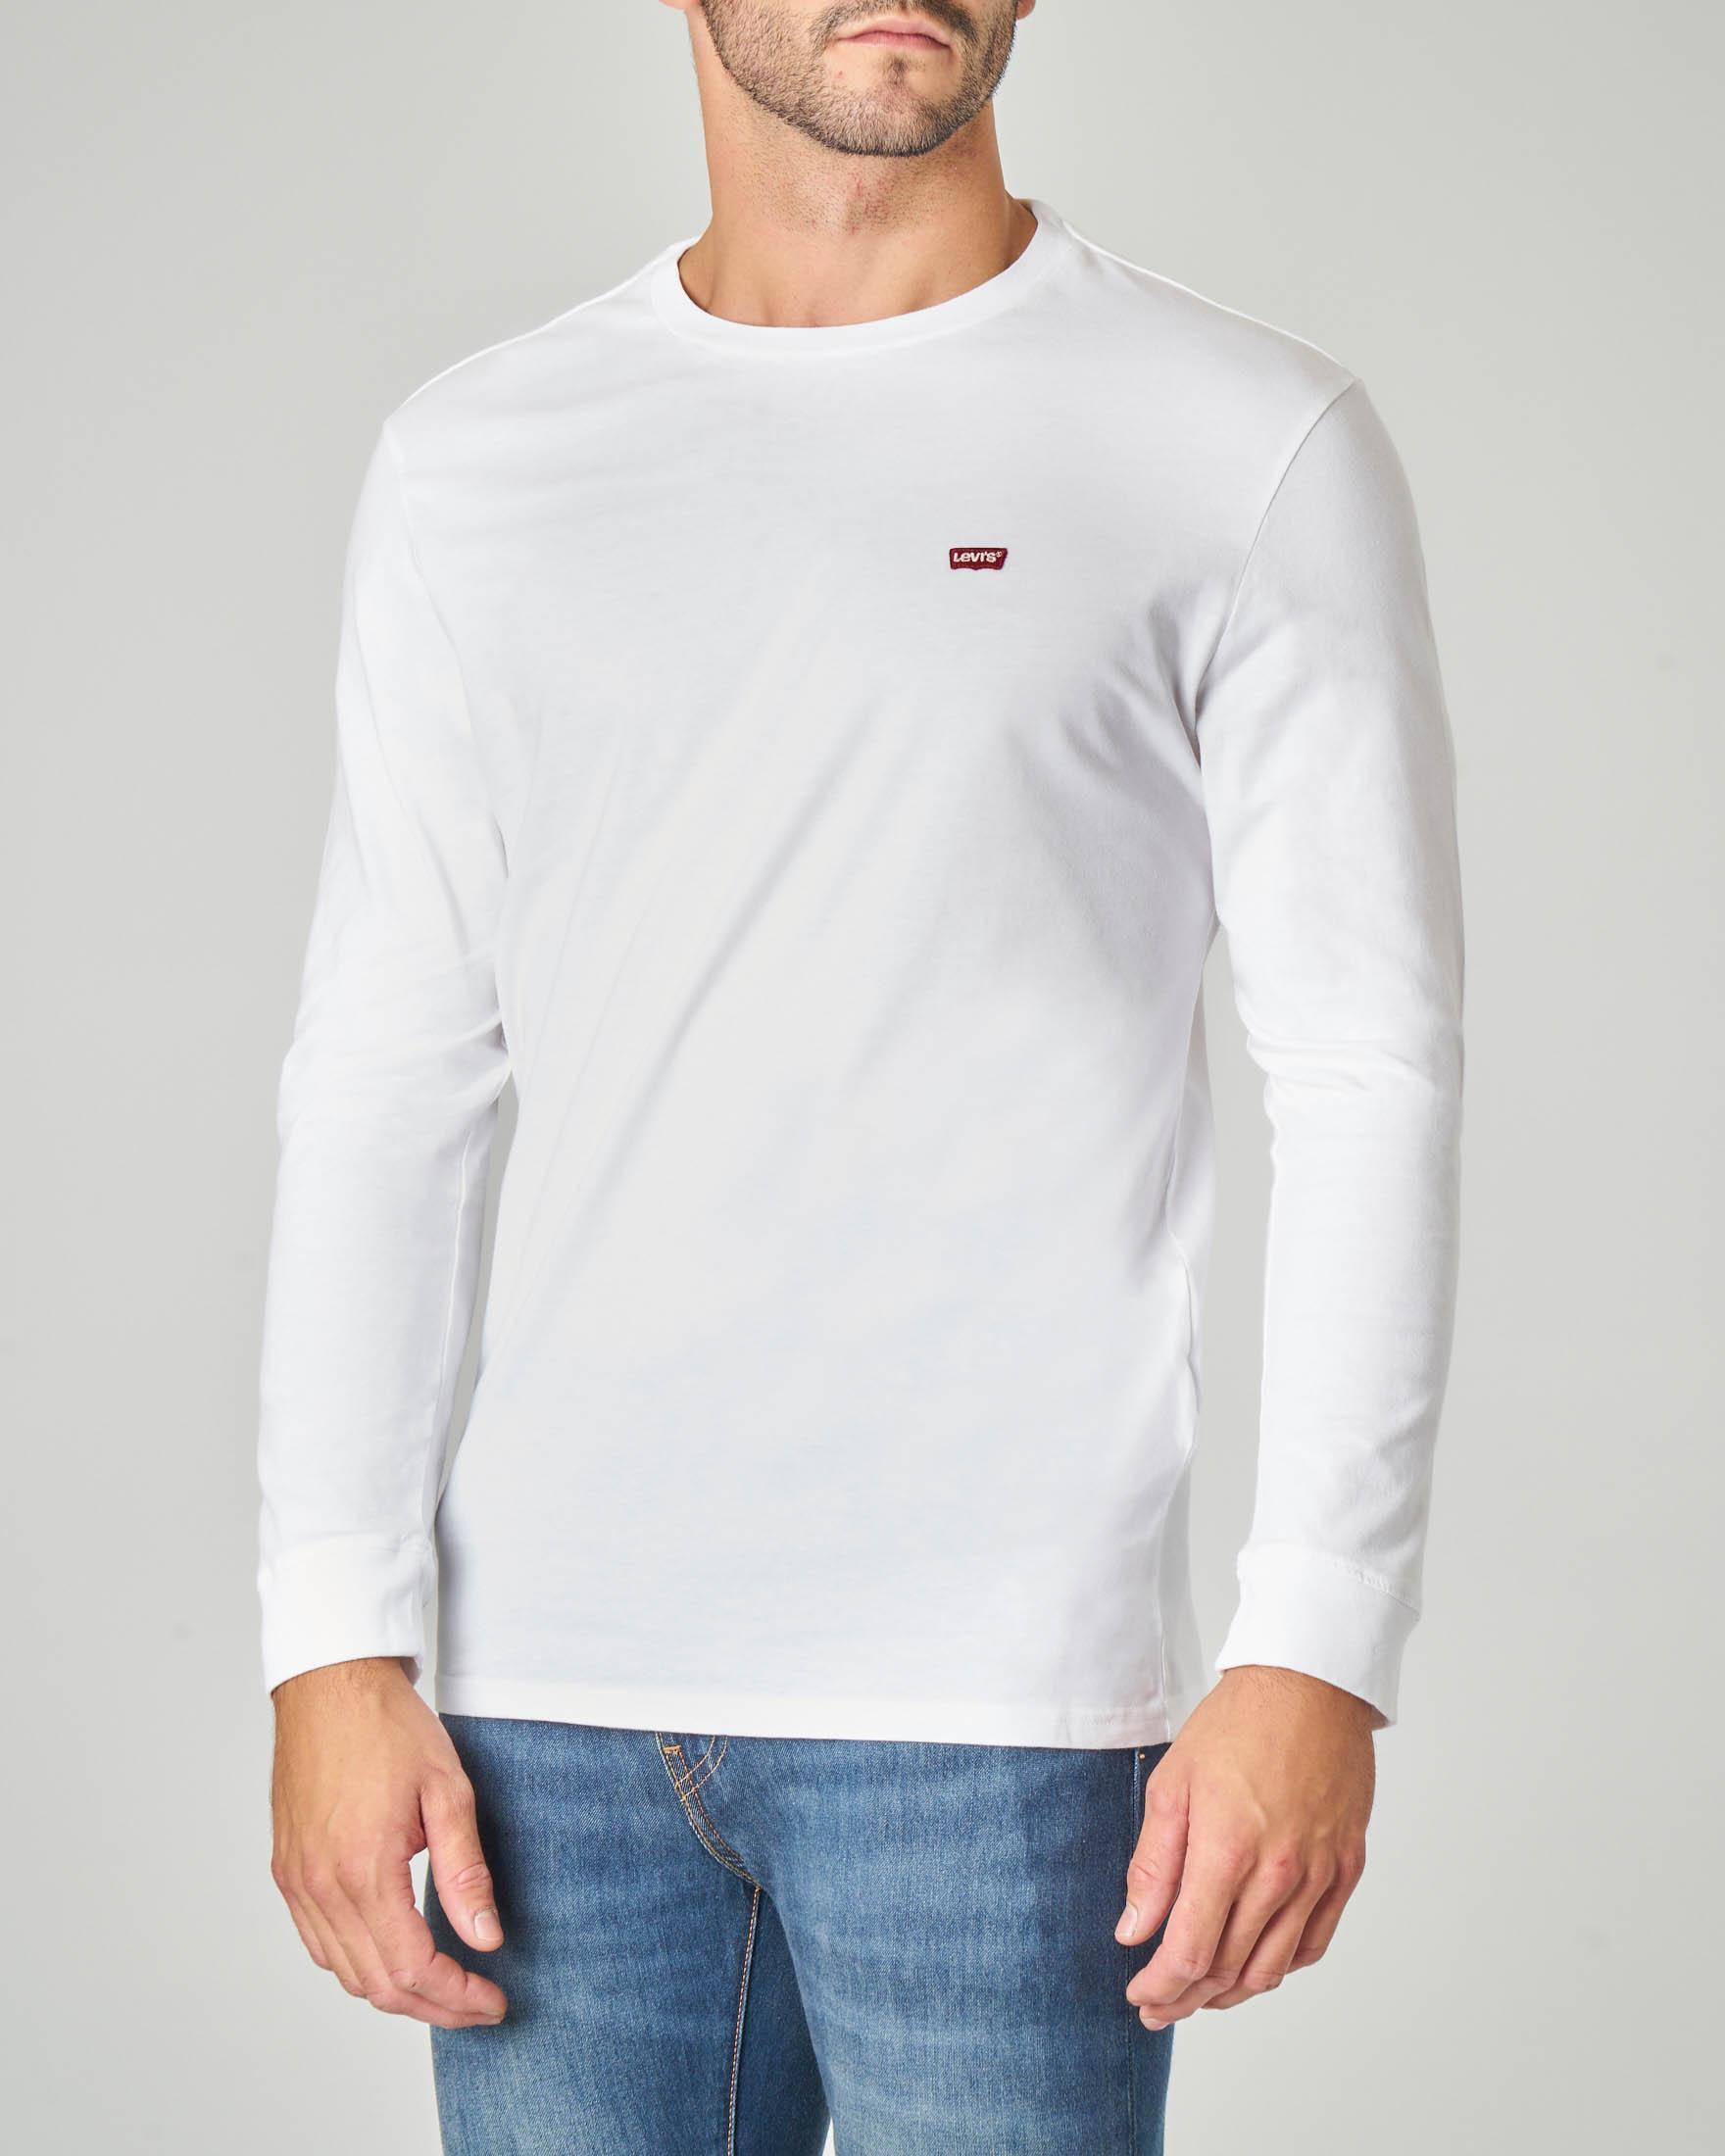 T-shirt bianca manica lunga con logo batwing piccolo